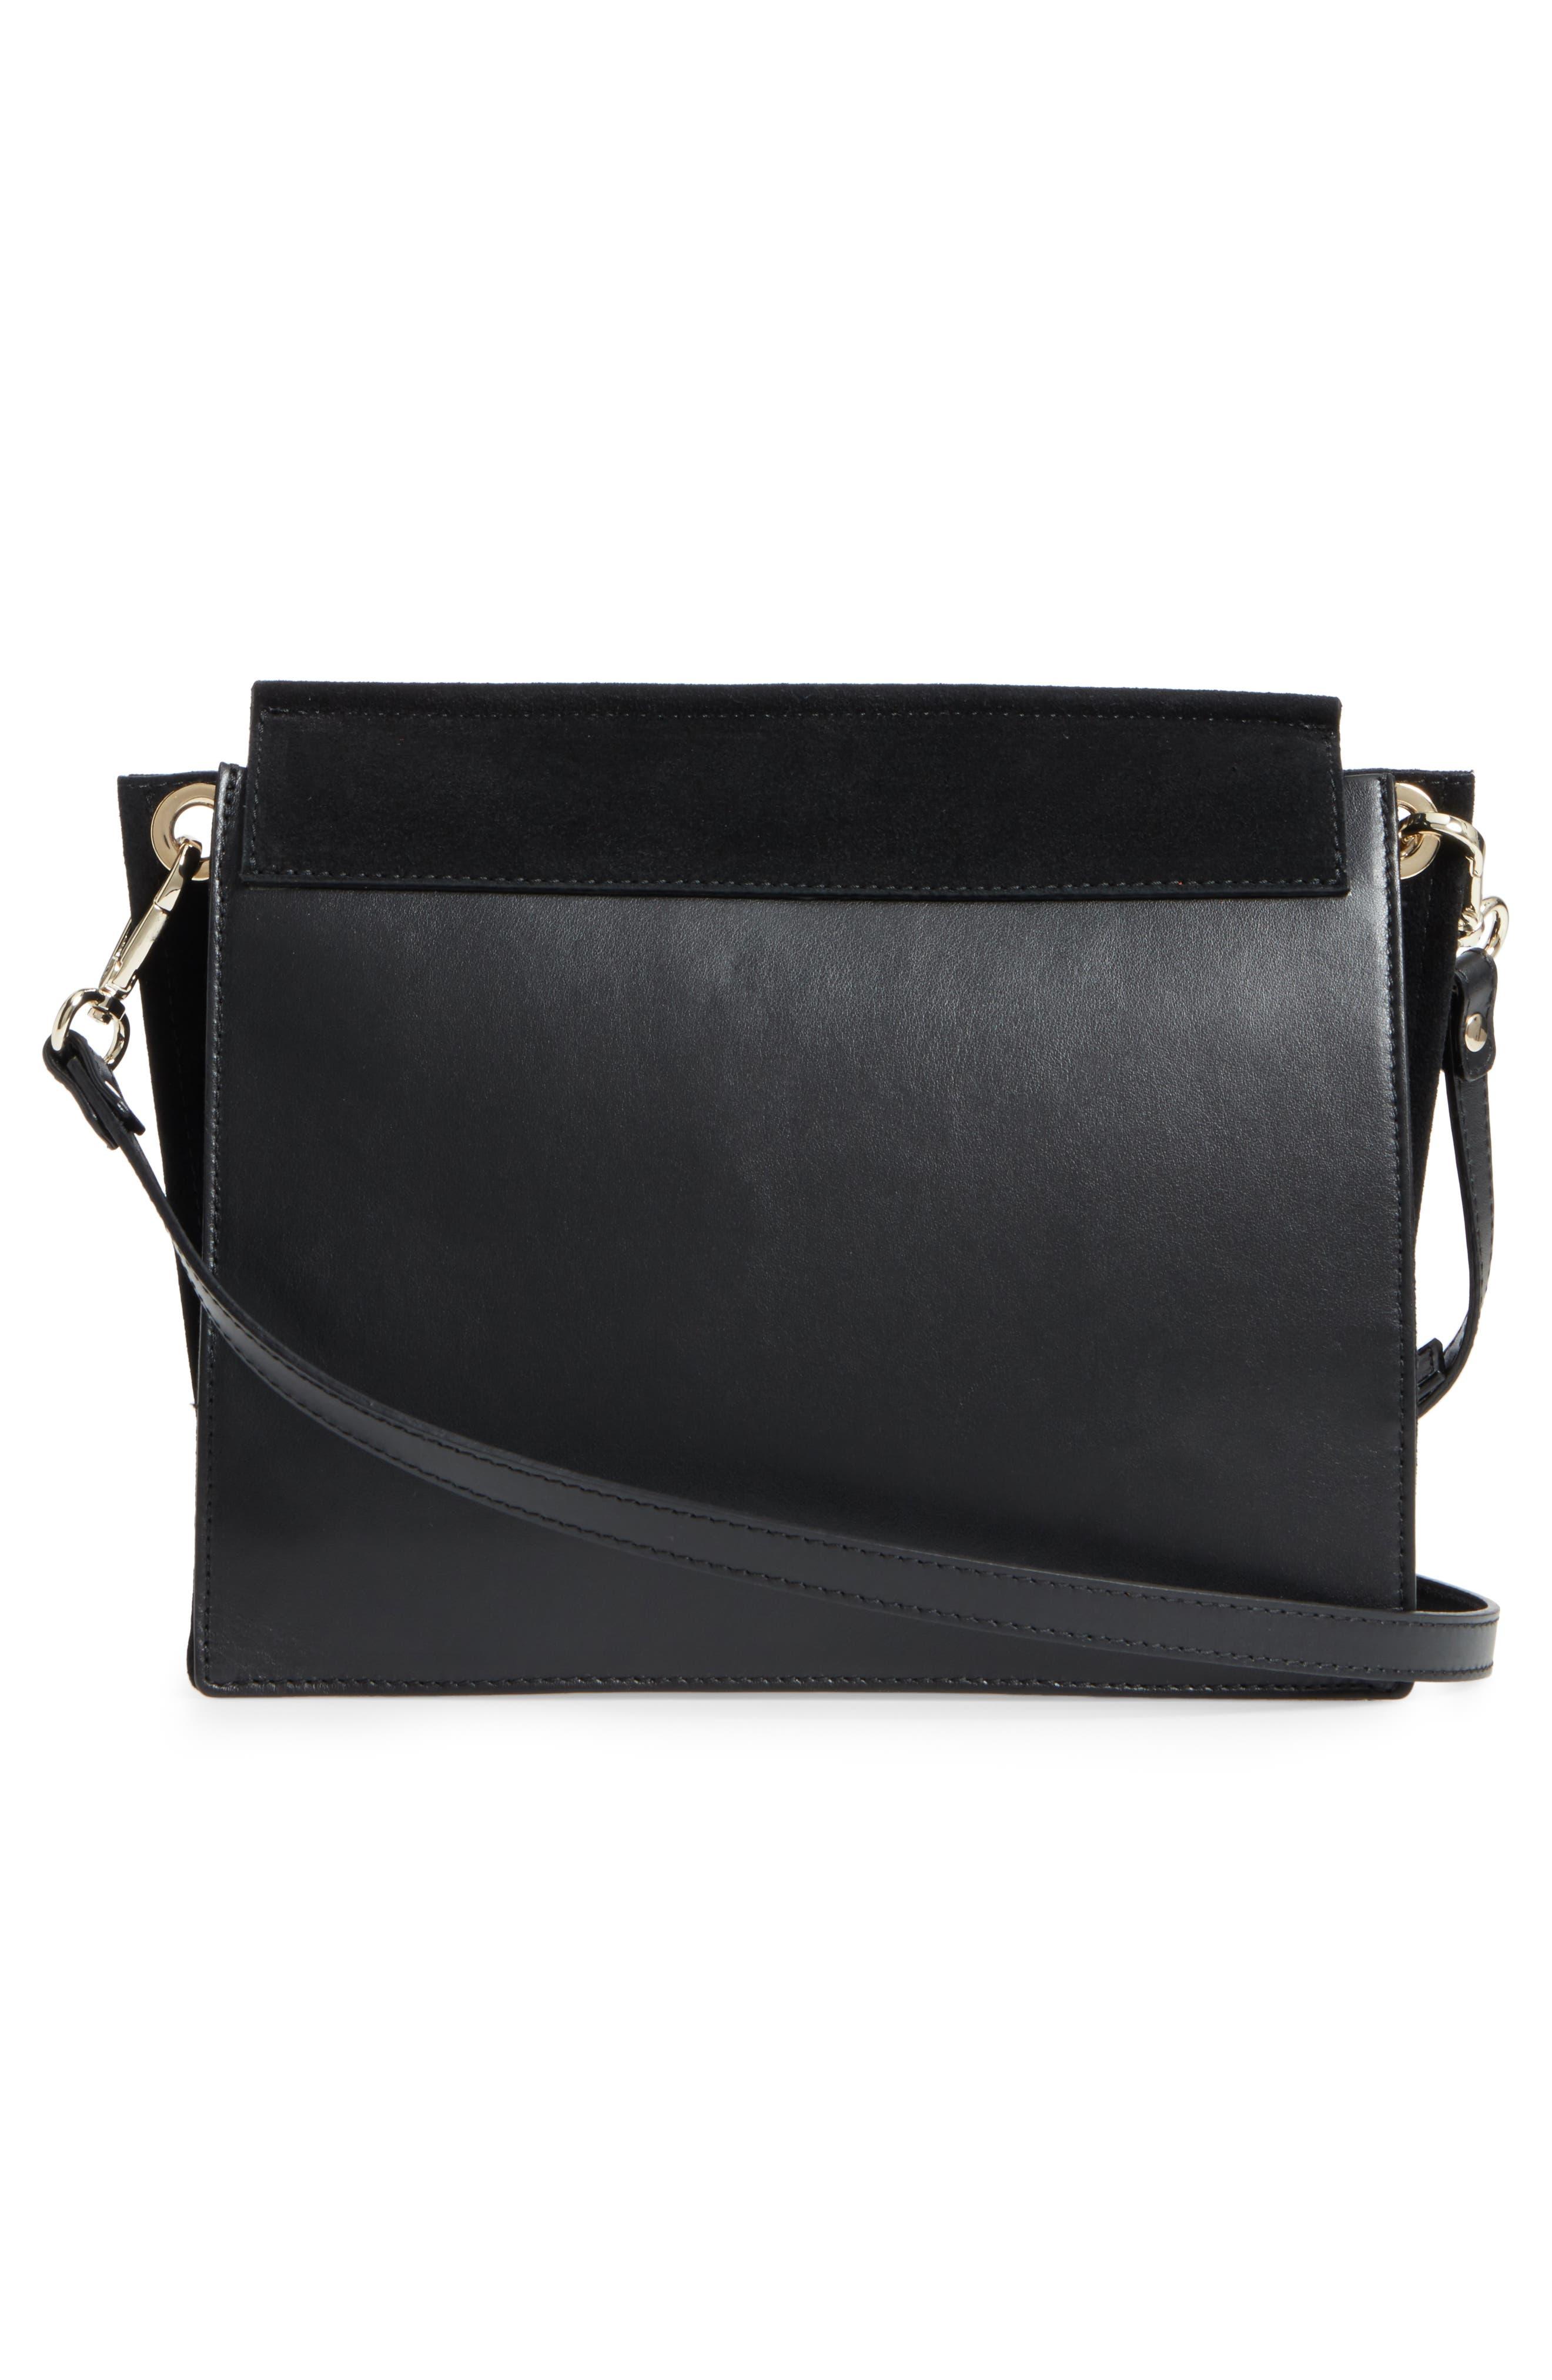 Premium Leather & Suede Soko Shoulder Bag,                             Alternate thumbnail 3, color,